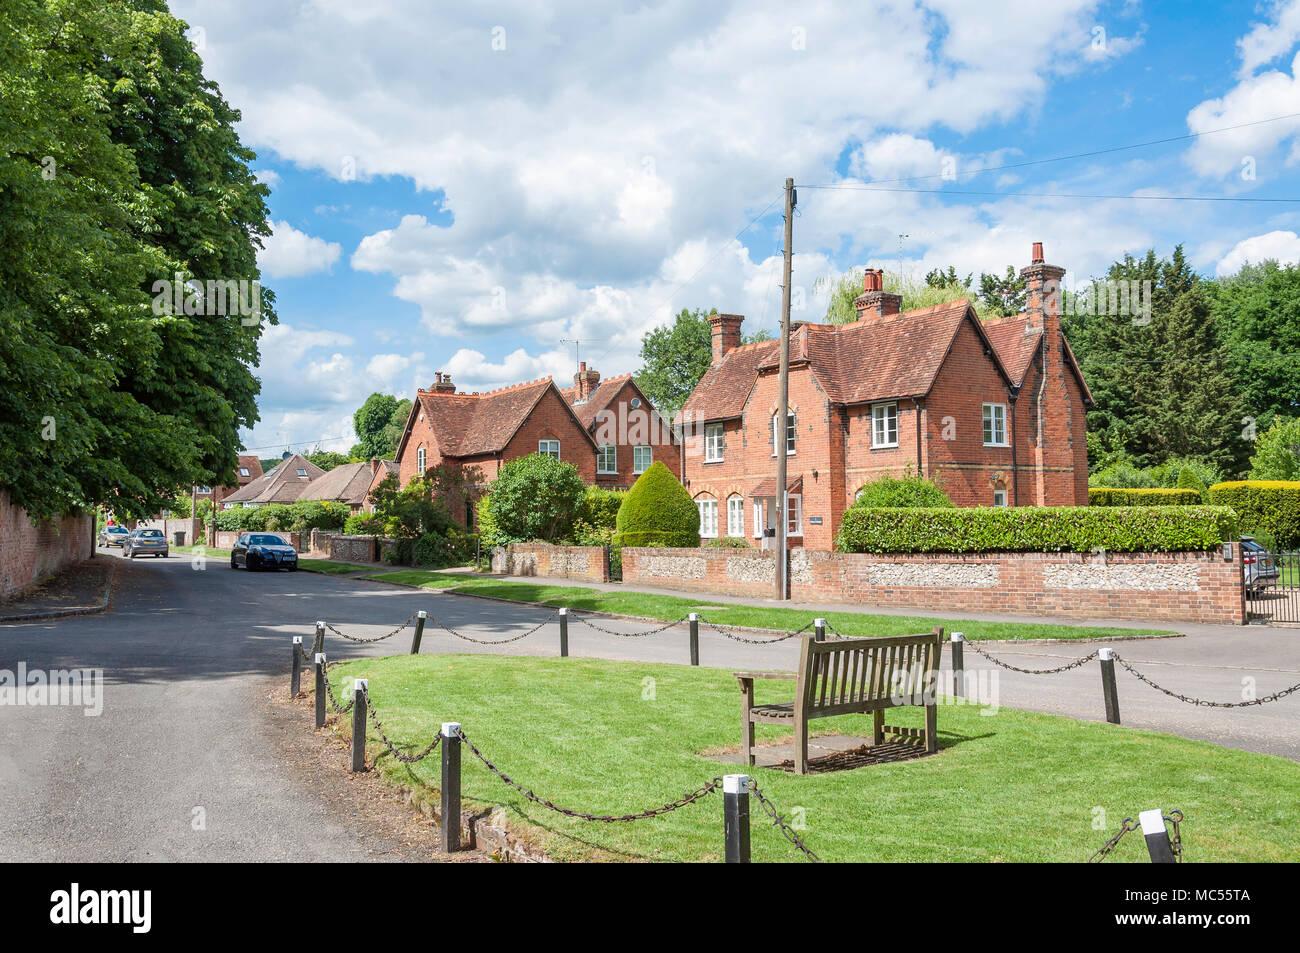 Houses on Church Road, Little Marlow, Buckinghamshire, England, United Kingdom Stock Photo